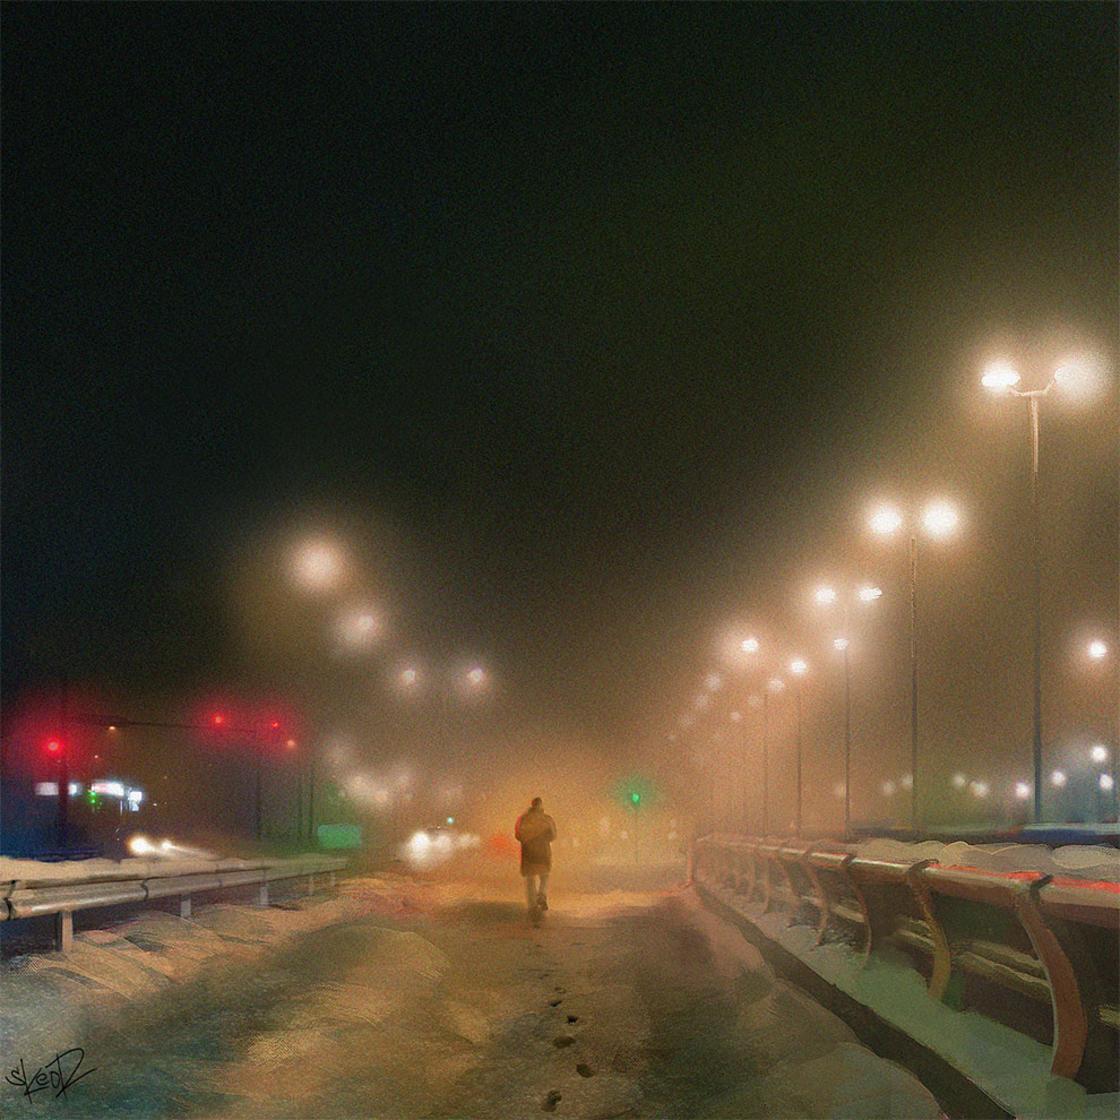 Chromatic Horizon – Les illustrations sombres et futuristes de Tony Skeor